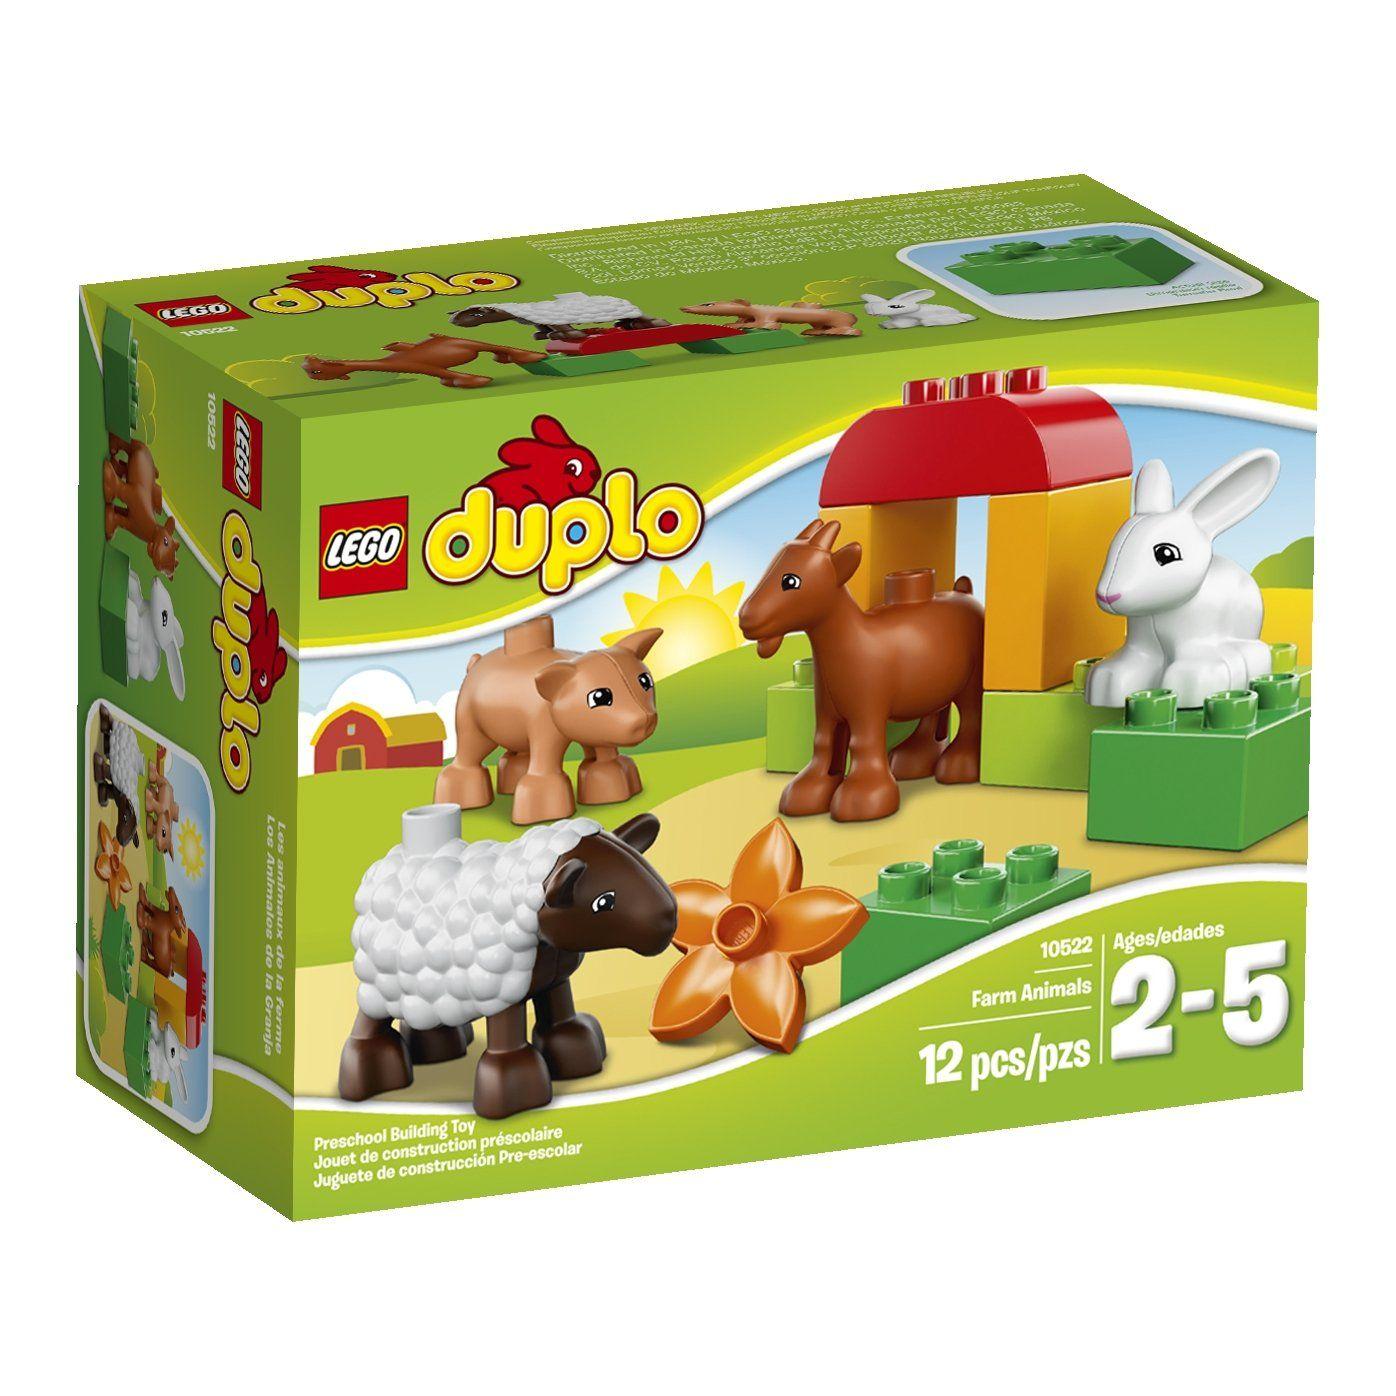 Amazoncom Duplo Lego Ville 10522 Farm Animals 8 Farm Play